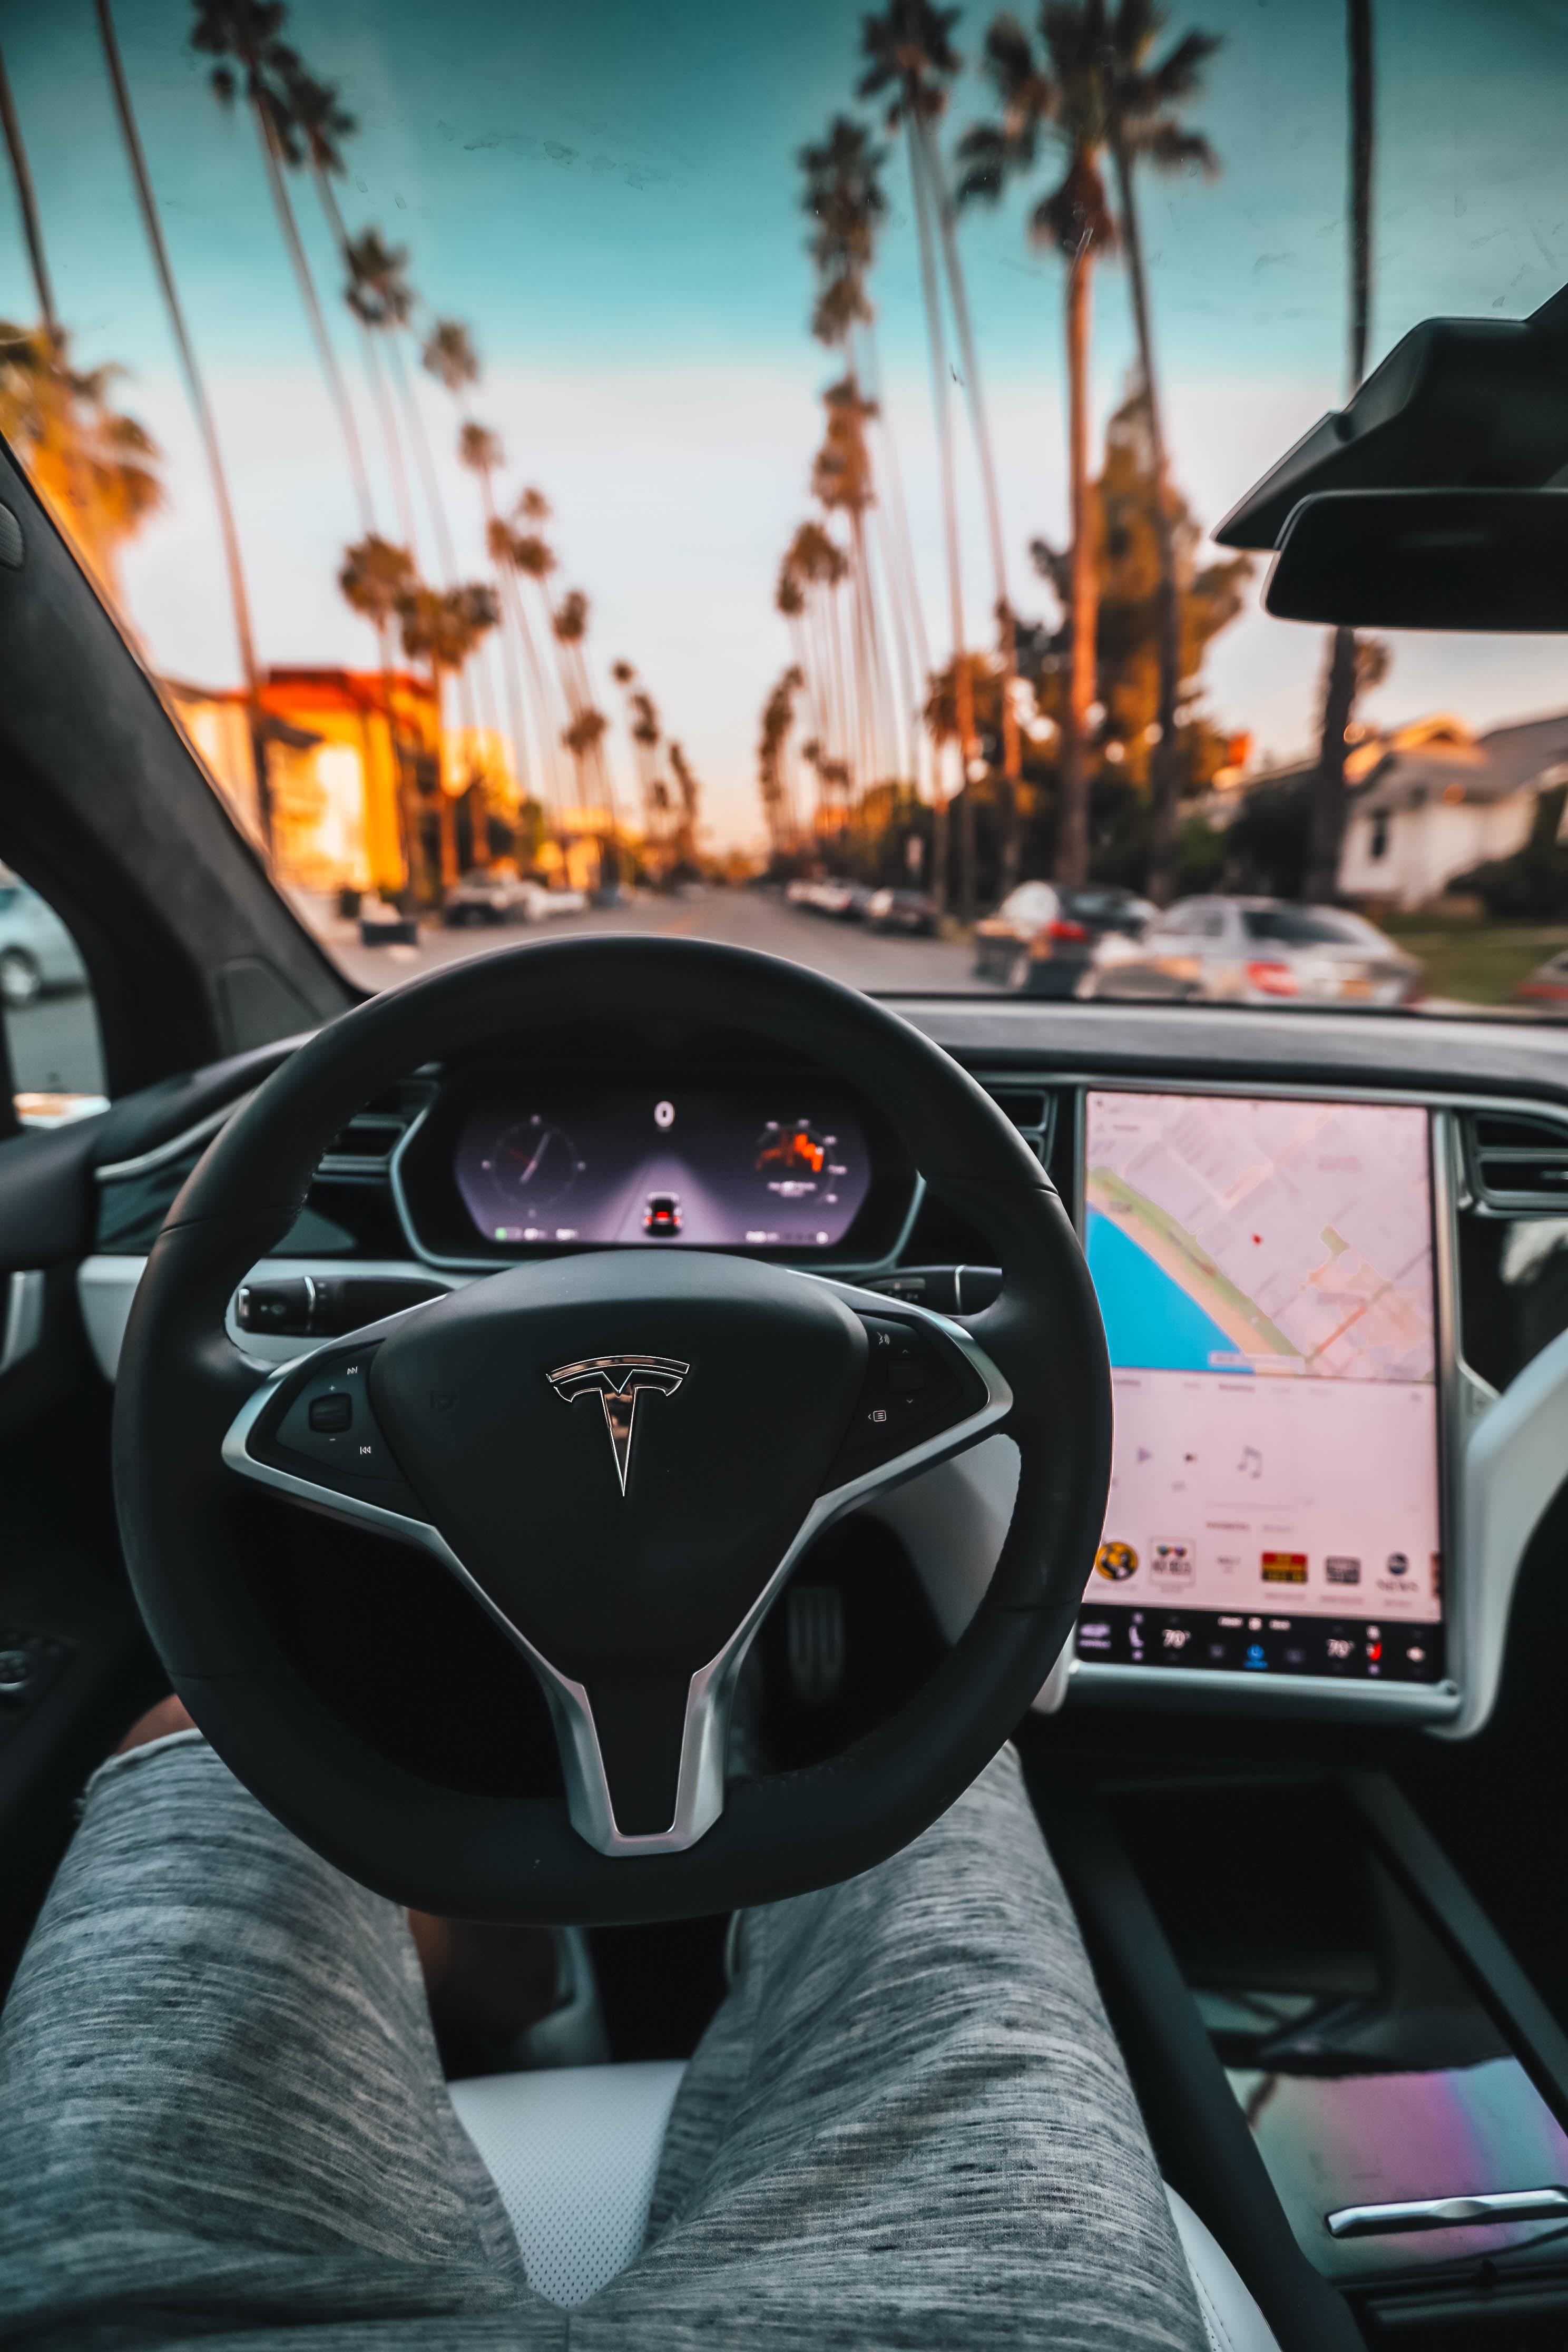 interior view of Tesla car